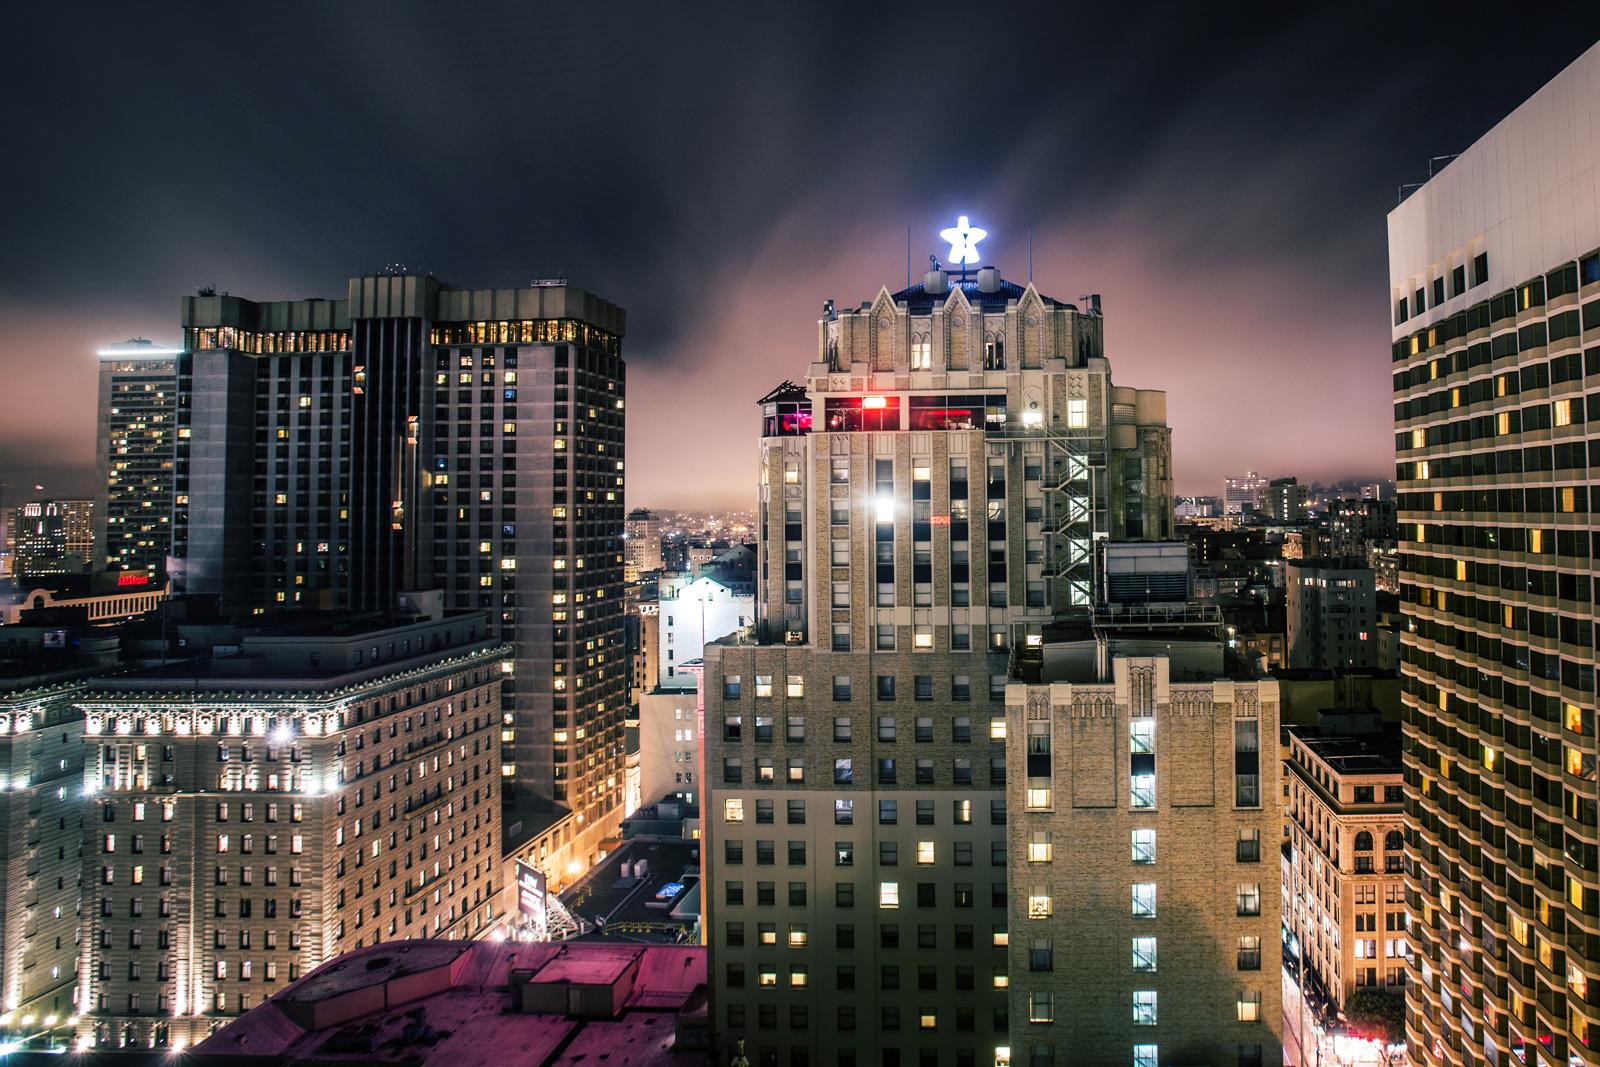 365 – 88 – Grand Hyatt San Francisco, California